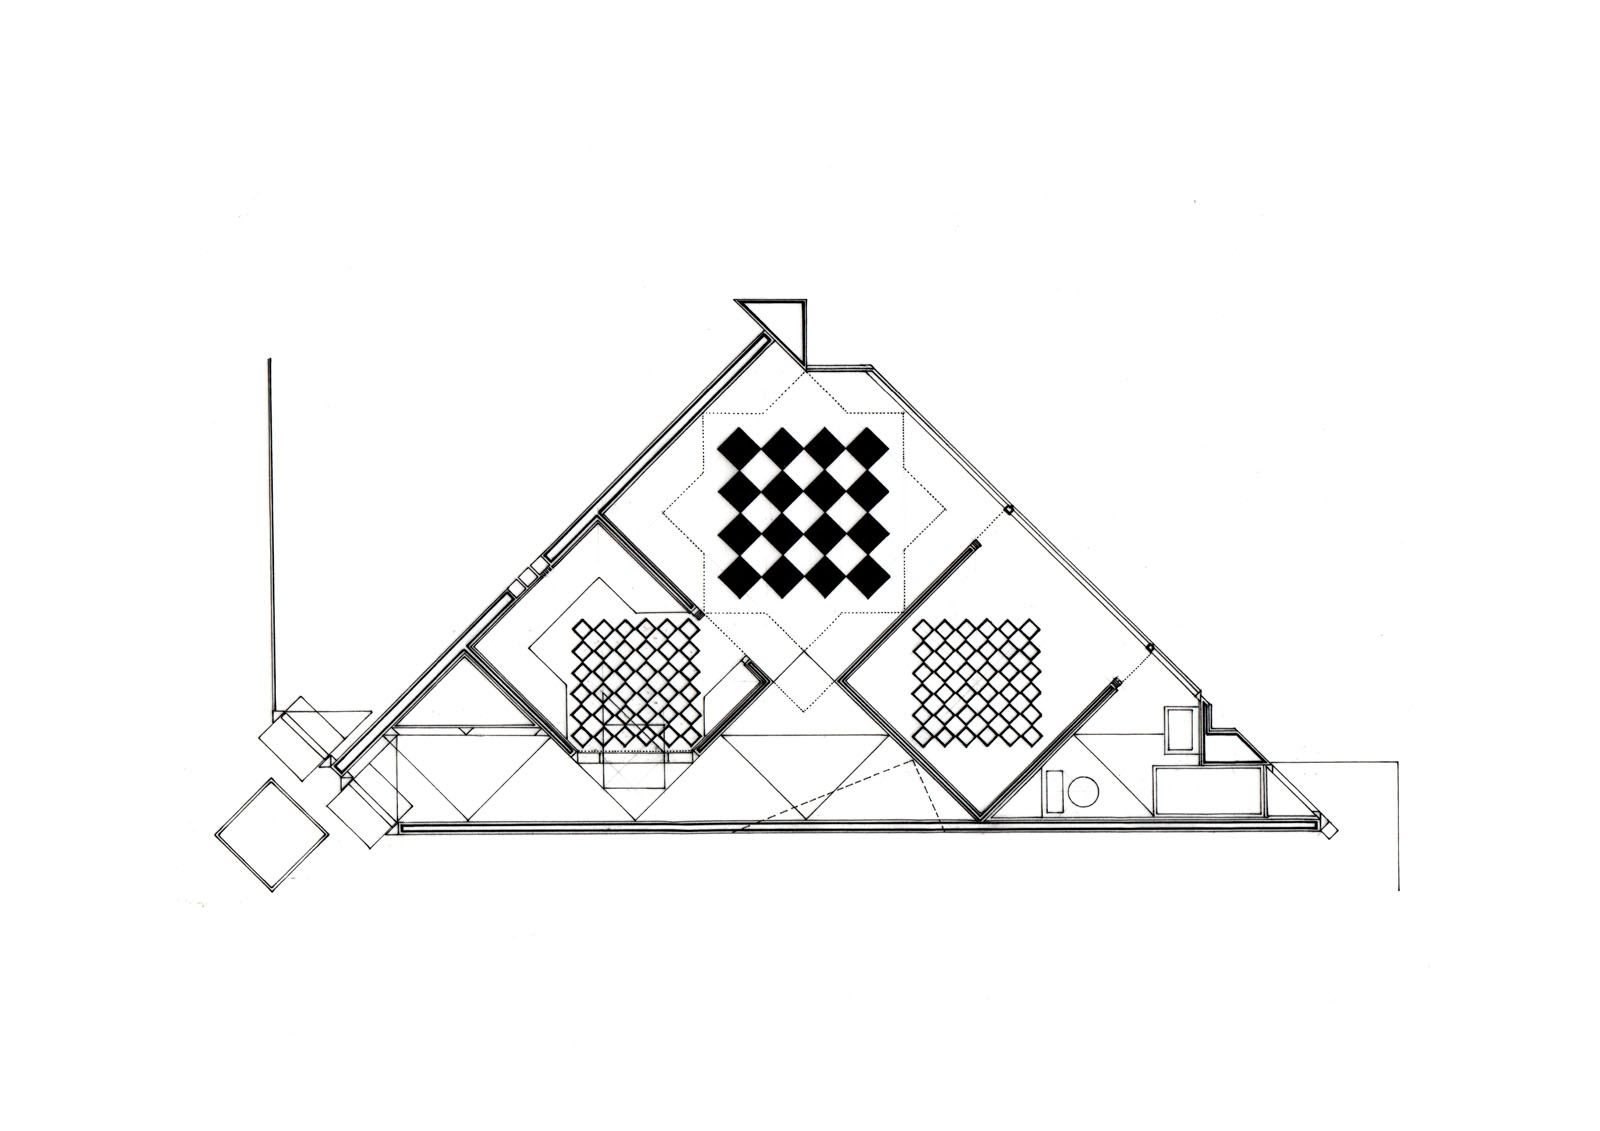 danielvillalobos-architecturexxthcentury-spanisharchitecture-schoolarchitectureproject-8